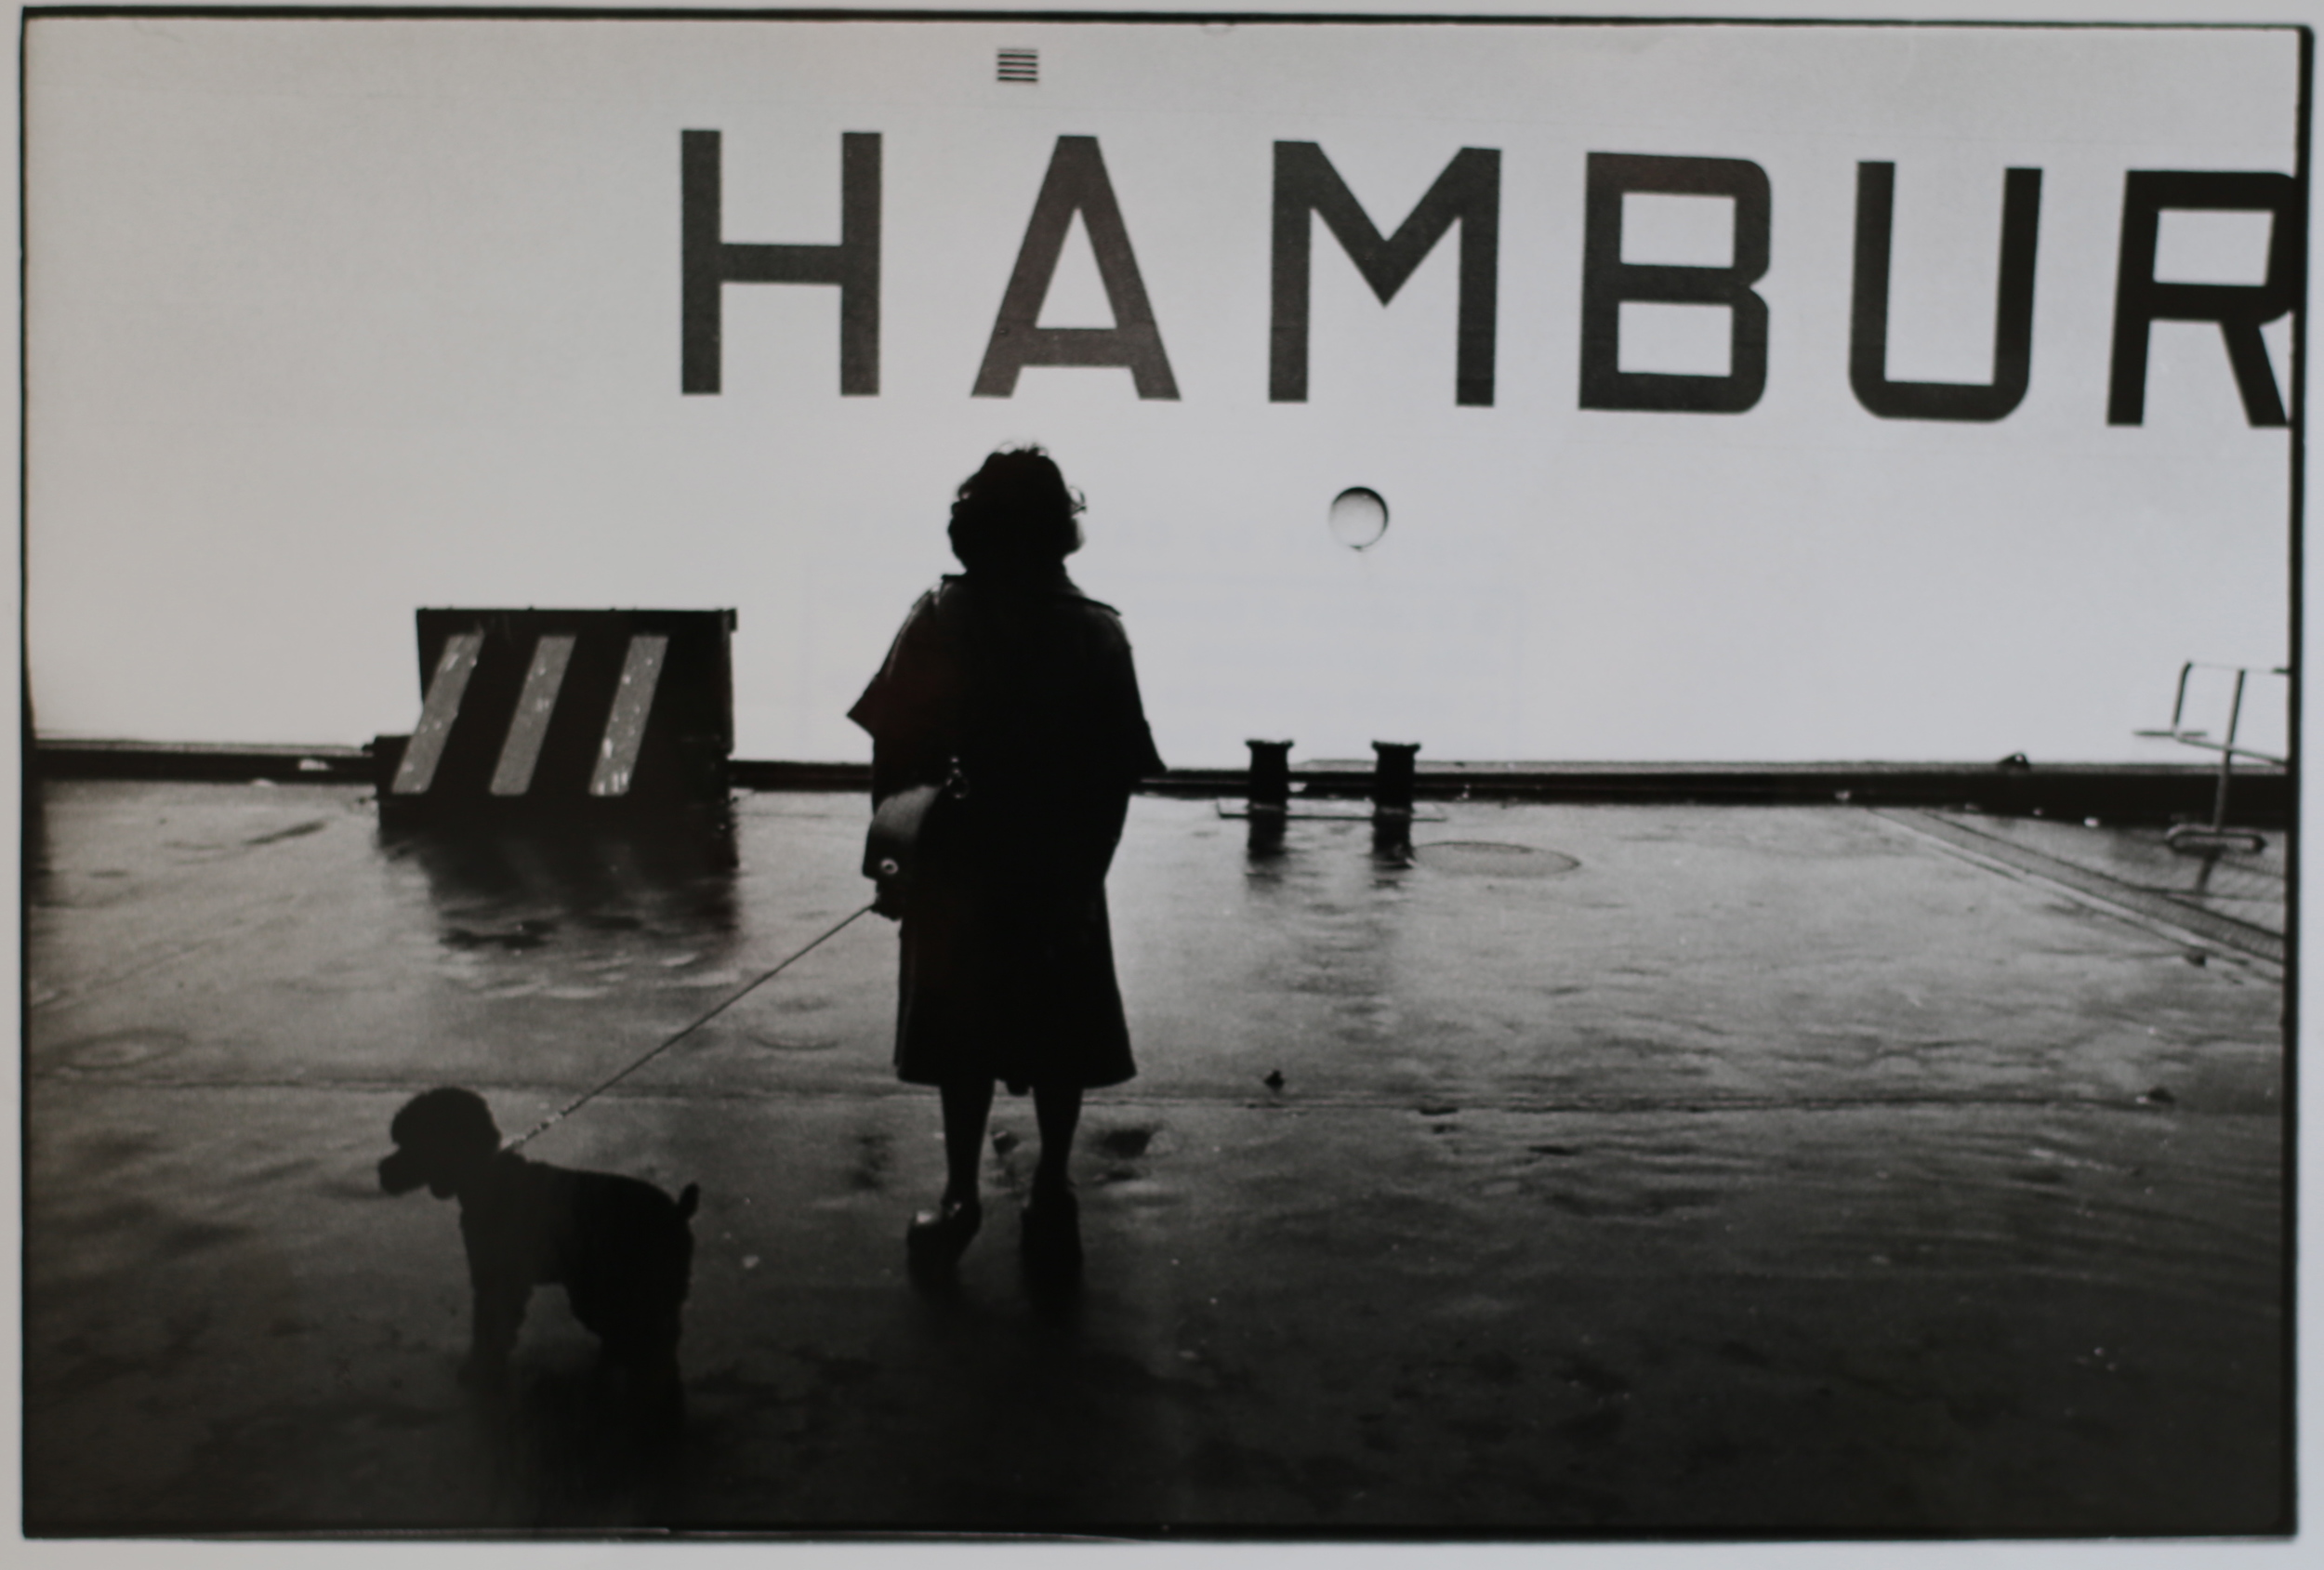 Porto imbarcadero passeggeri. Amburgo, 1975.